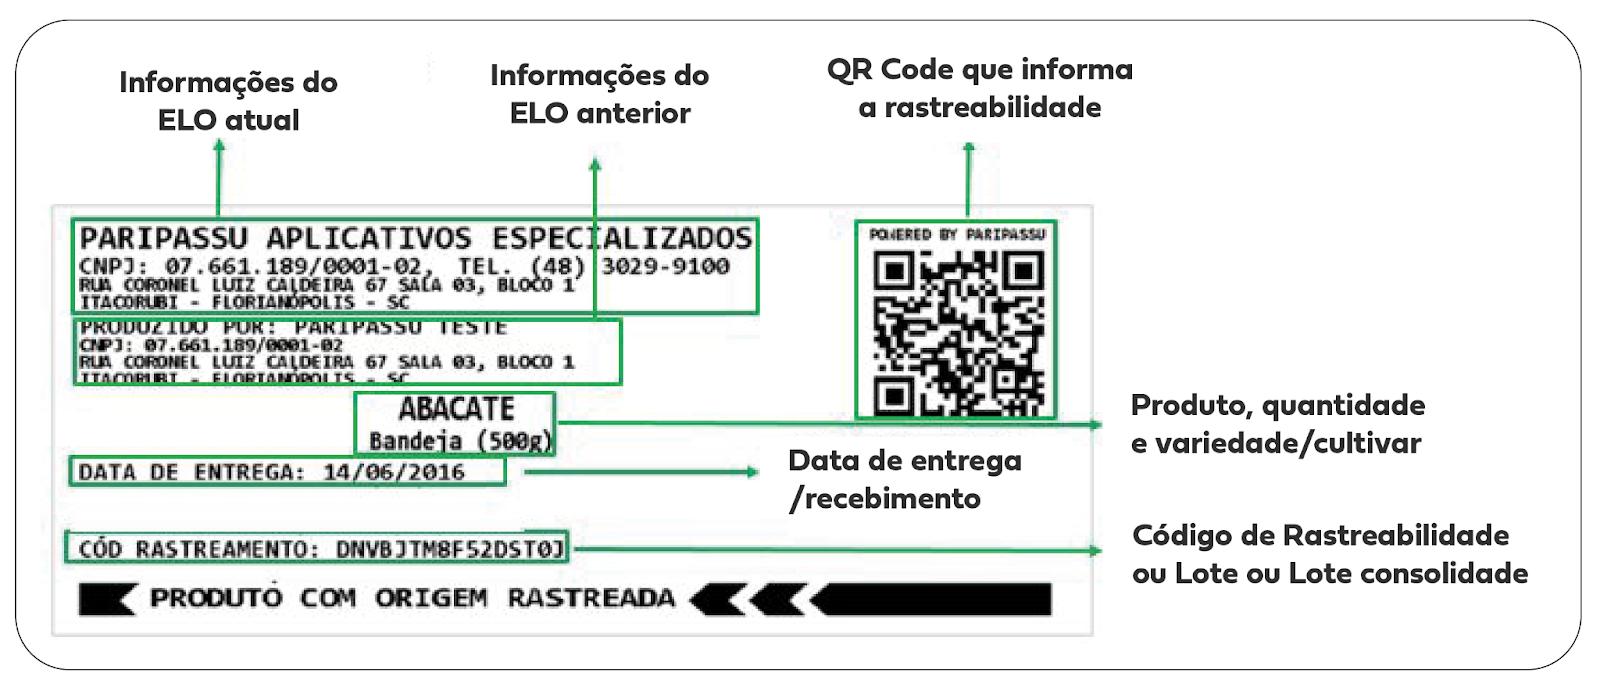 etiqueta-qr-core-rastreabilidade